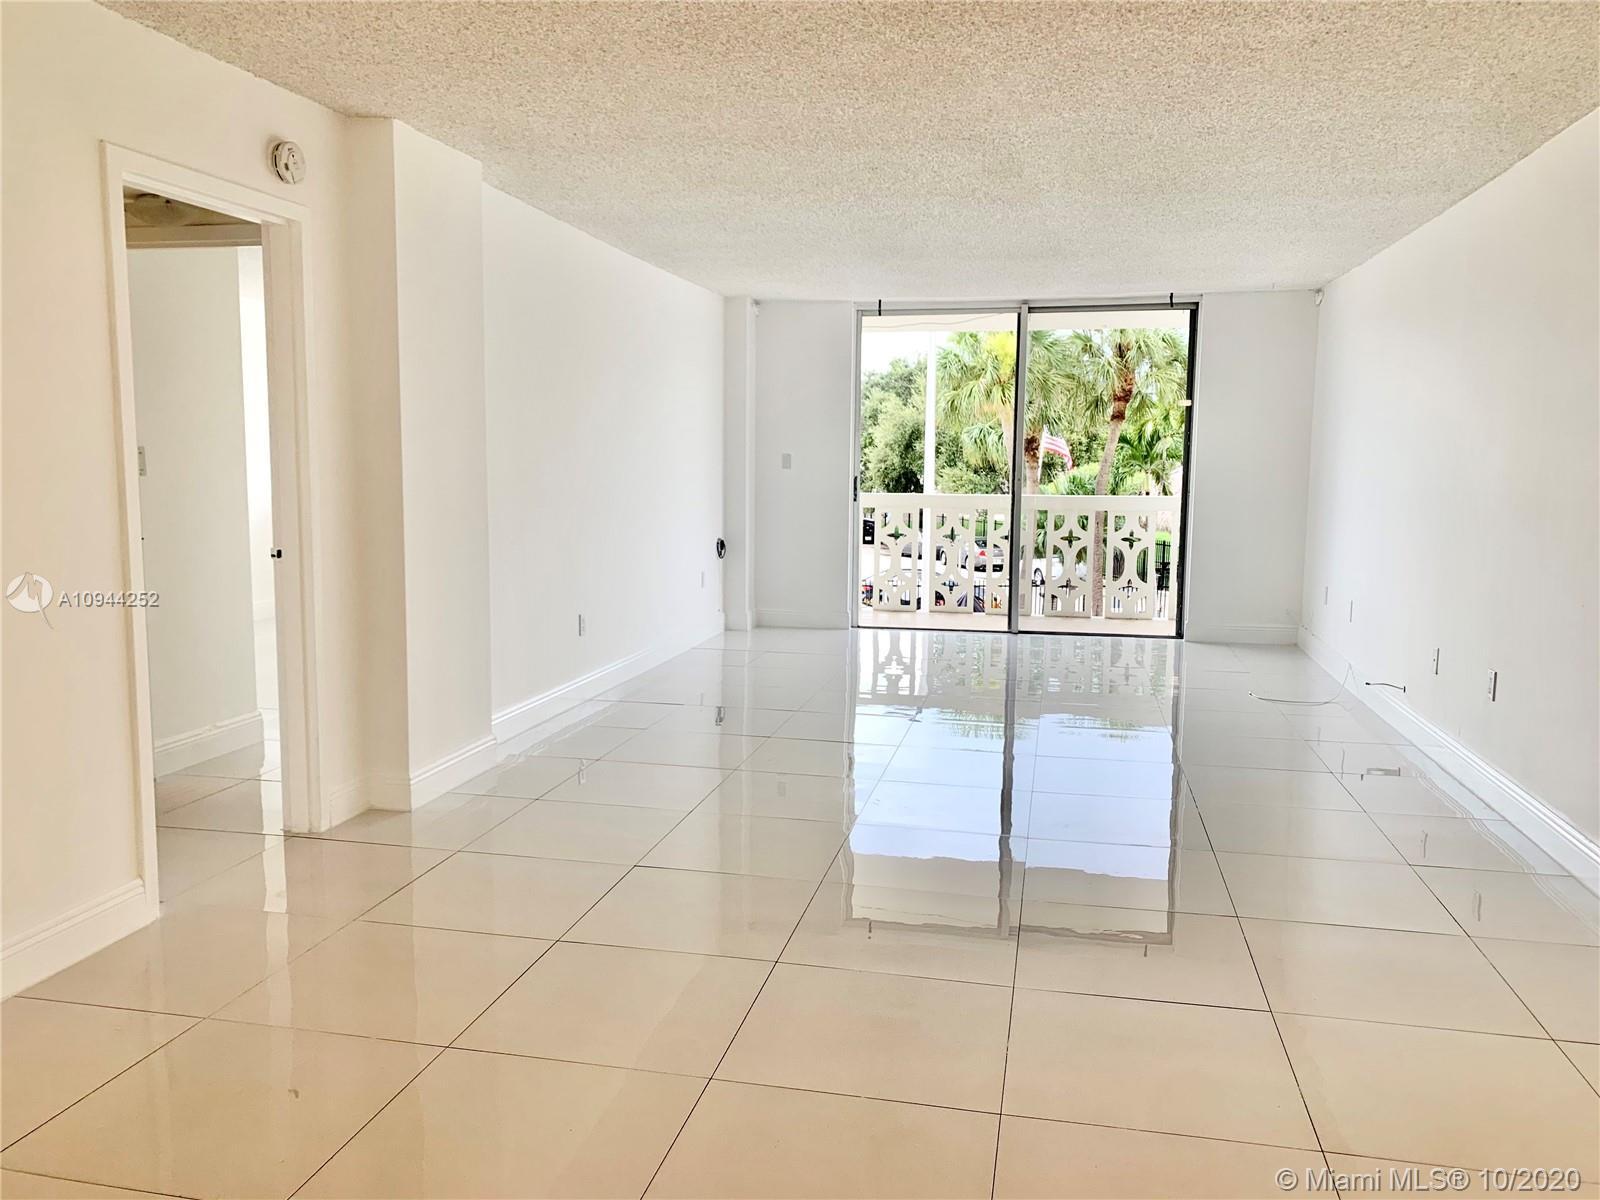 13155 Ixora Ct # 201, North Miami, Florida 33181, 2 Bedrooms Bedrooms, ,2 BathroomsBathrooms,Residential Lease,For Rent,13155 Ixora Ct # 201,A10944252